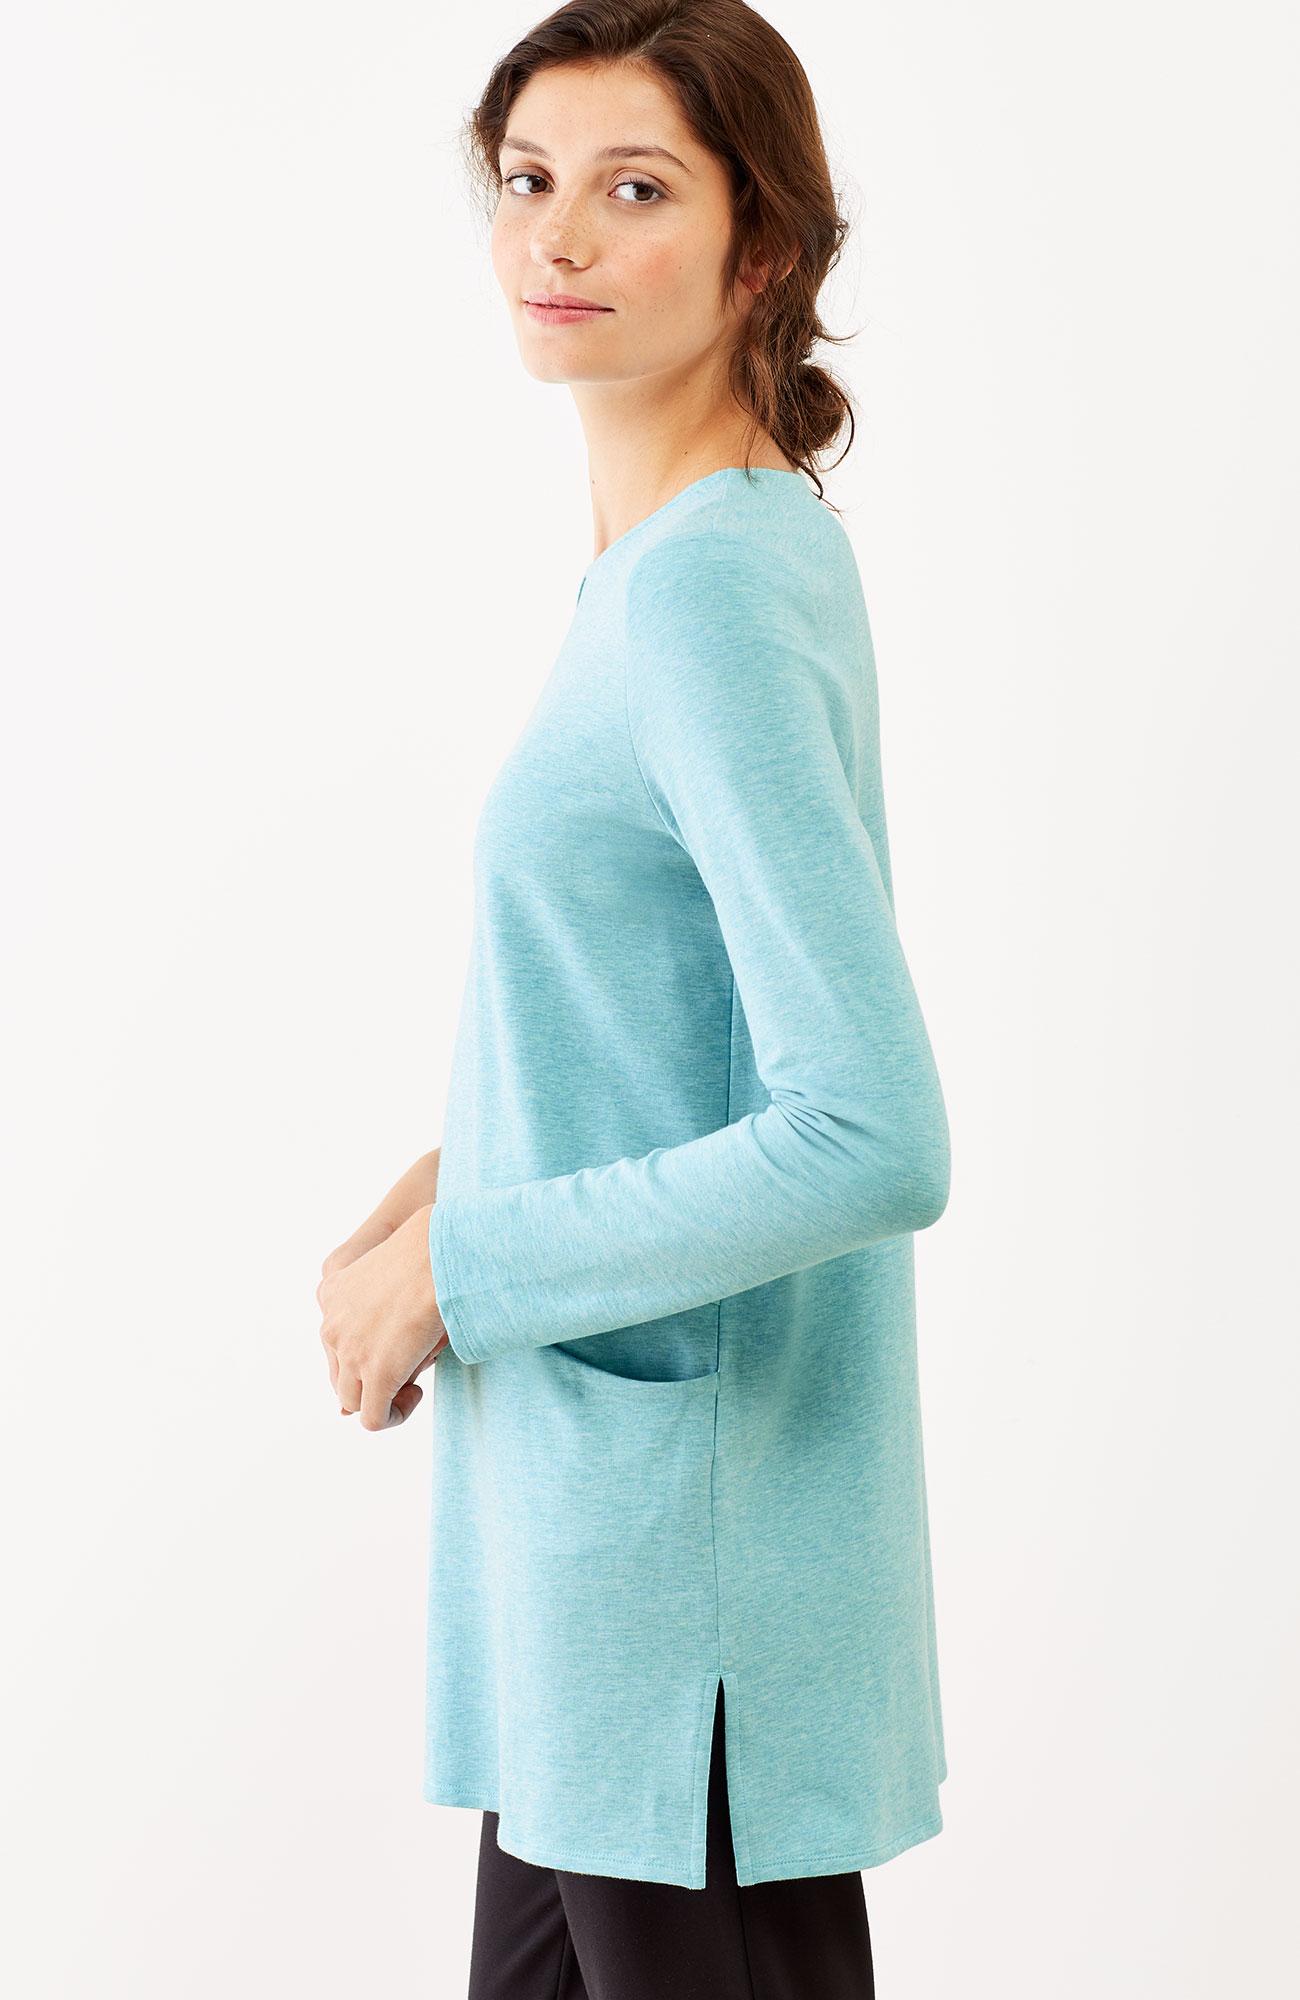 Pure Jill seamed two-pocket tunic